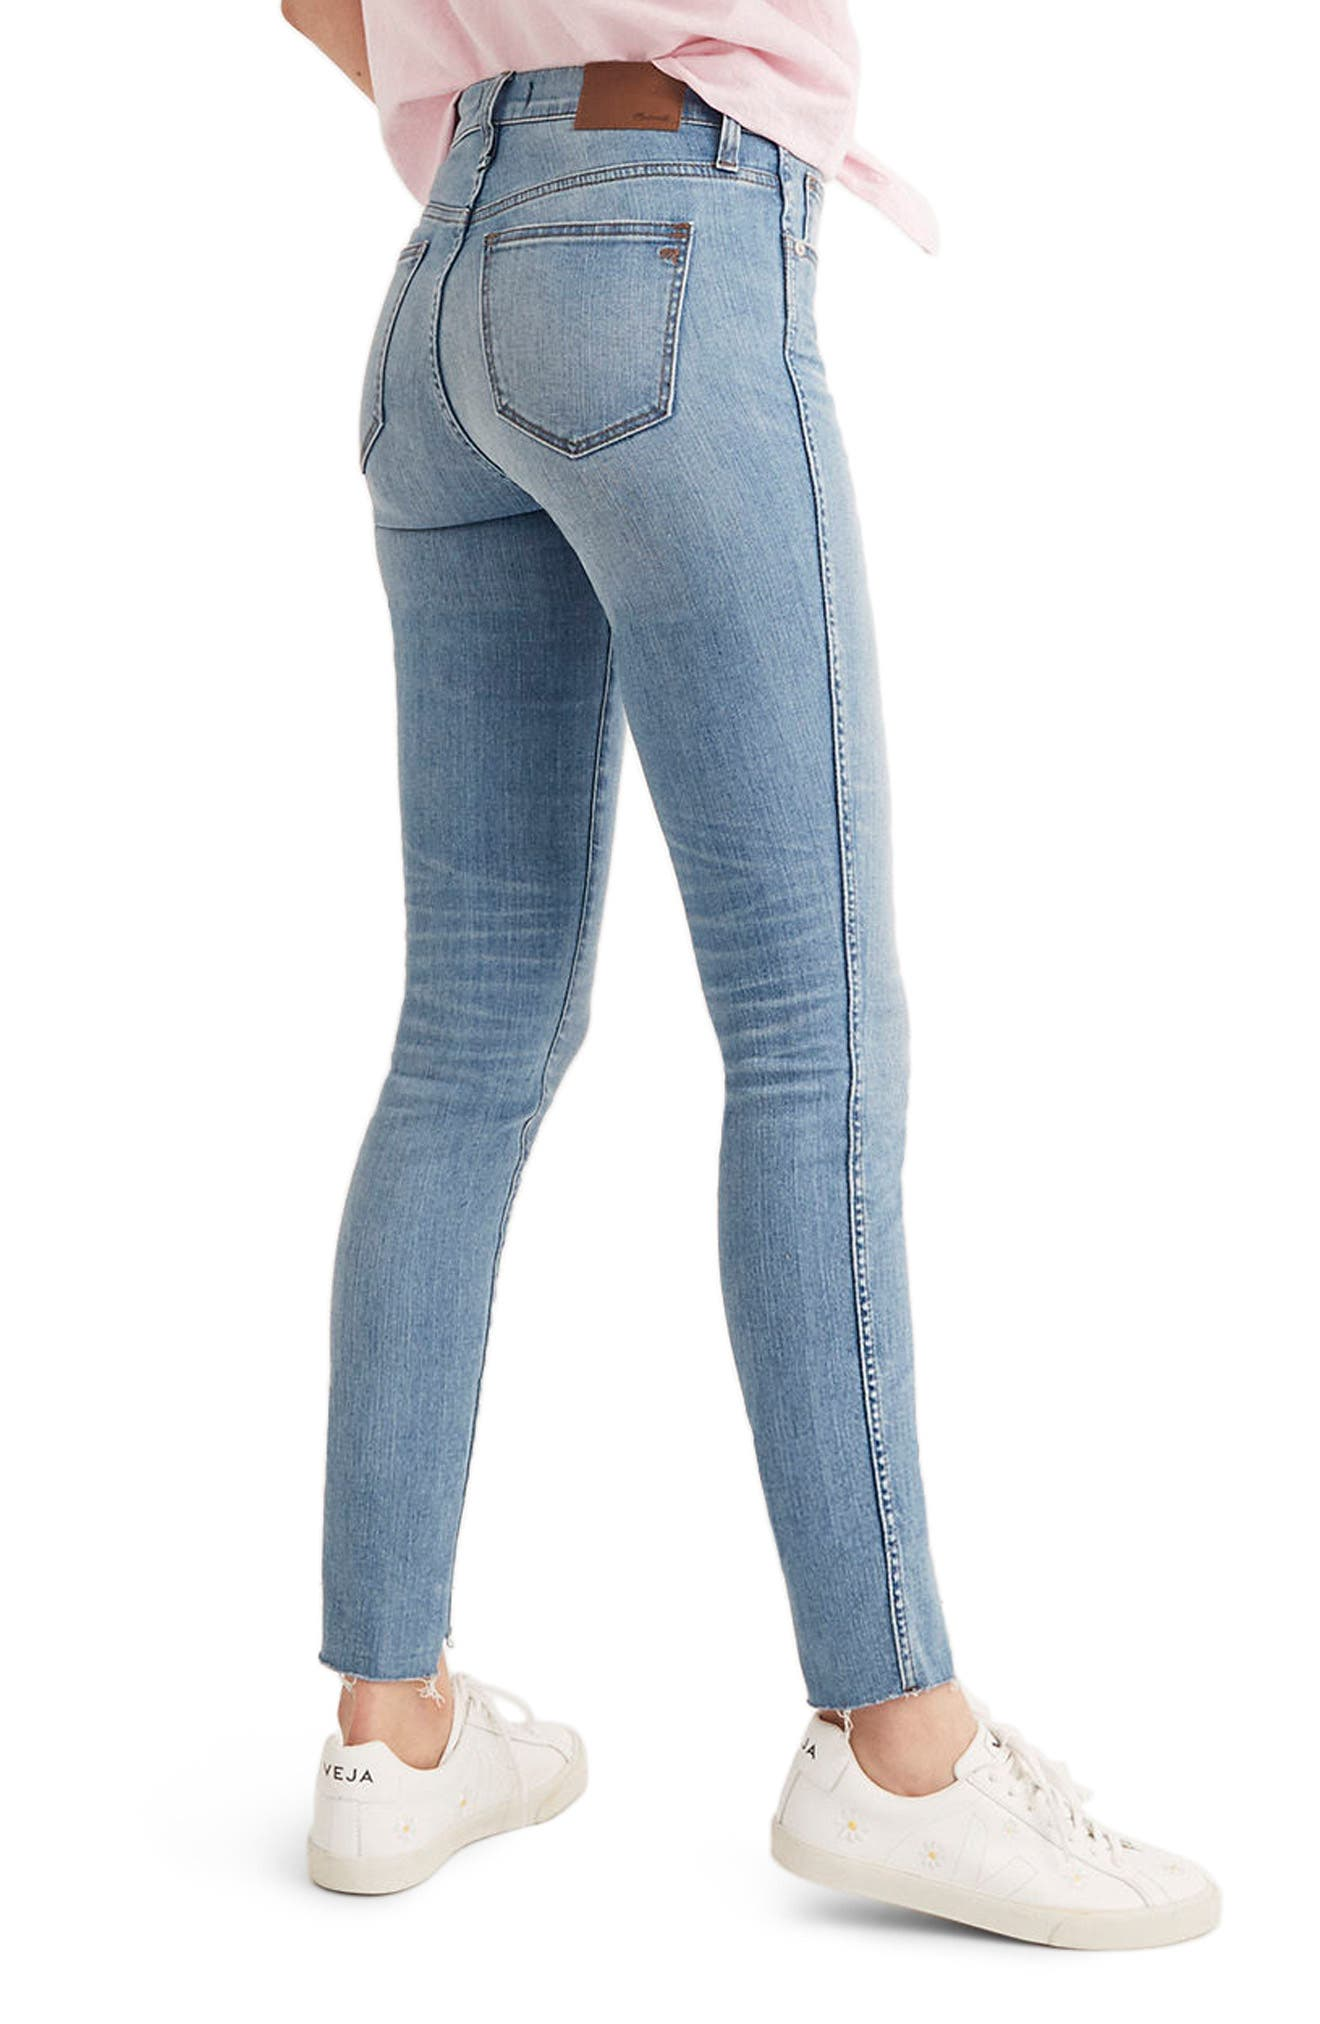 9-Inch High Waist Seamed Step-Hem Edition Skinny Jeans,                             Alternate thumbnail 3, color,                             August